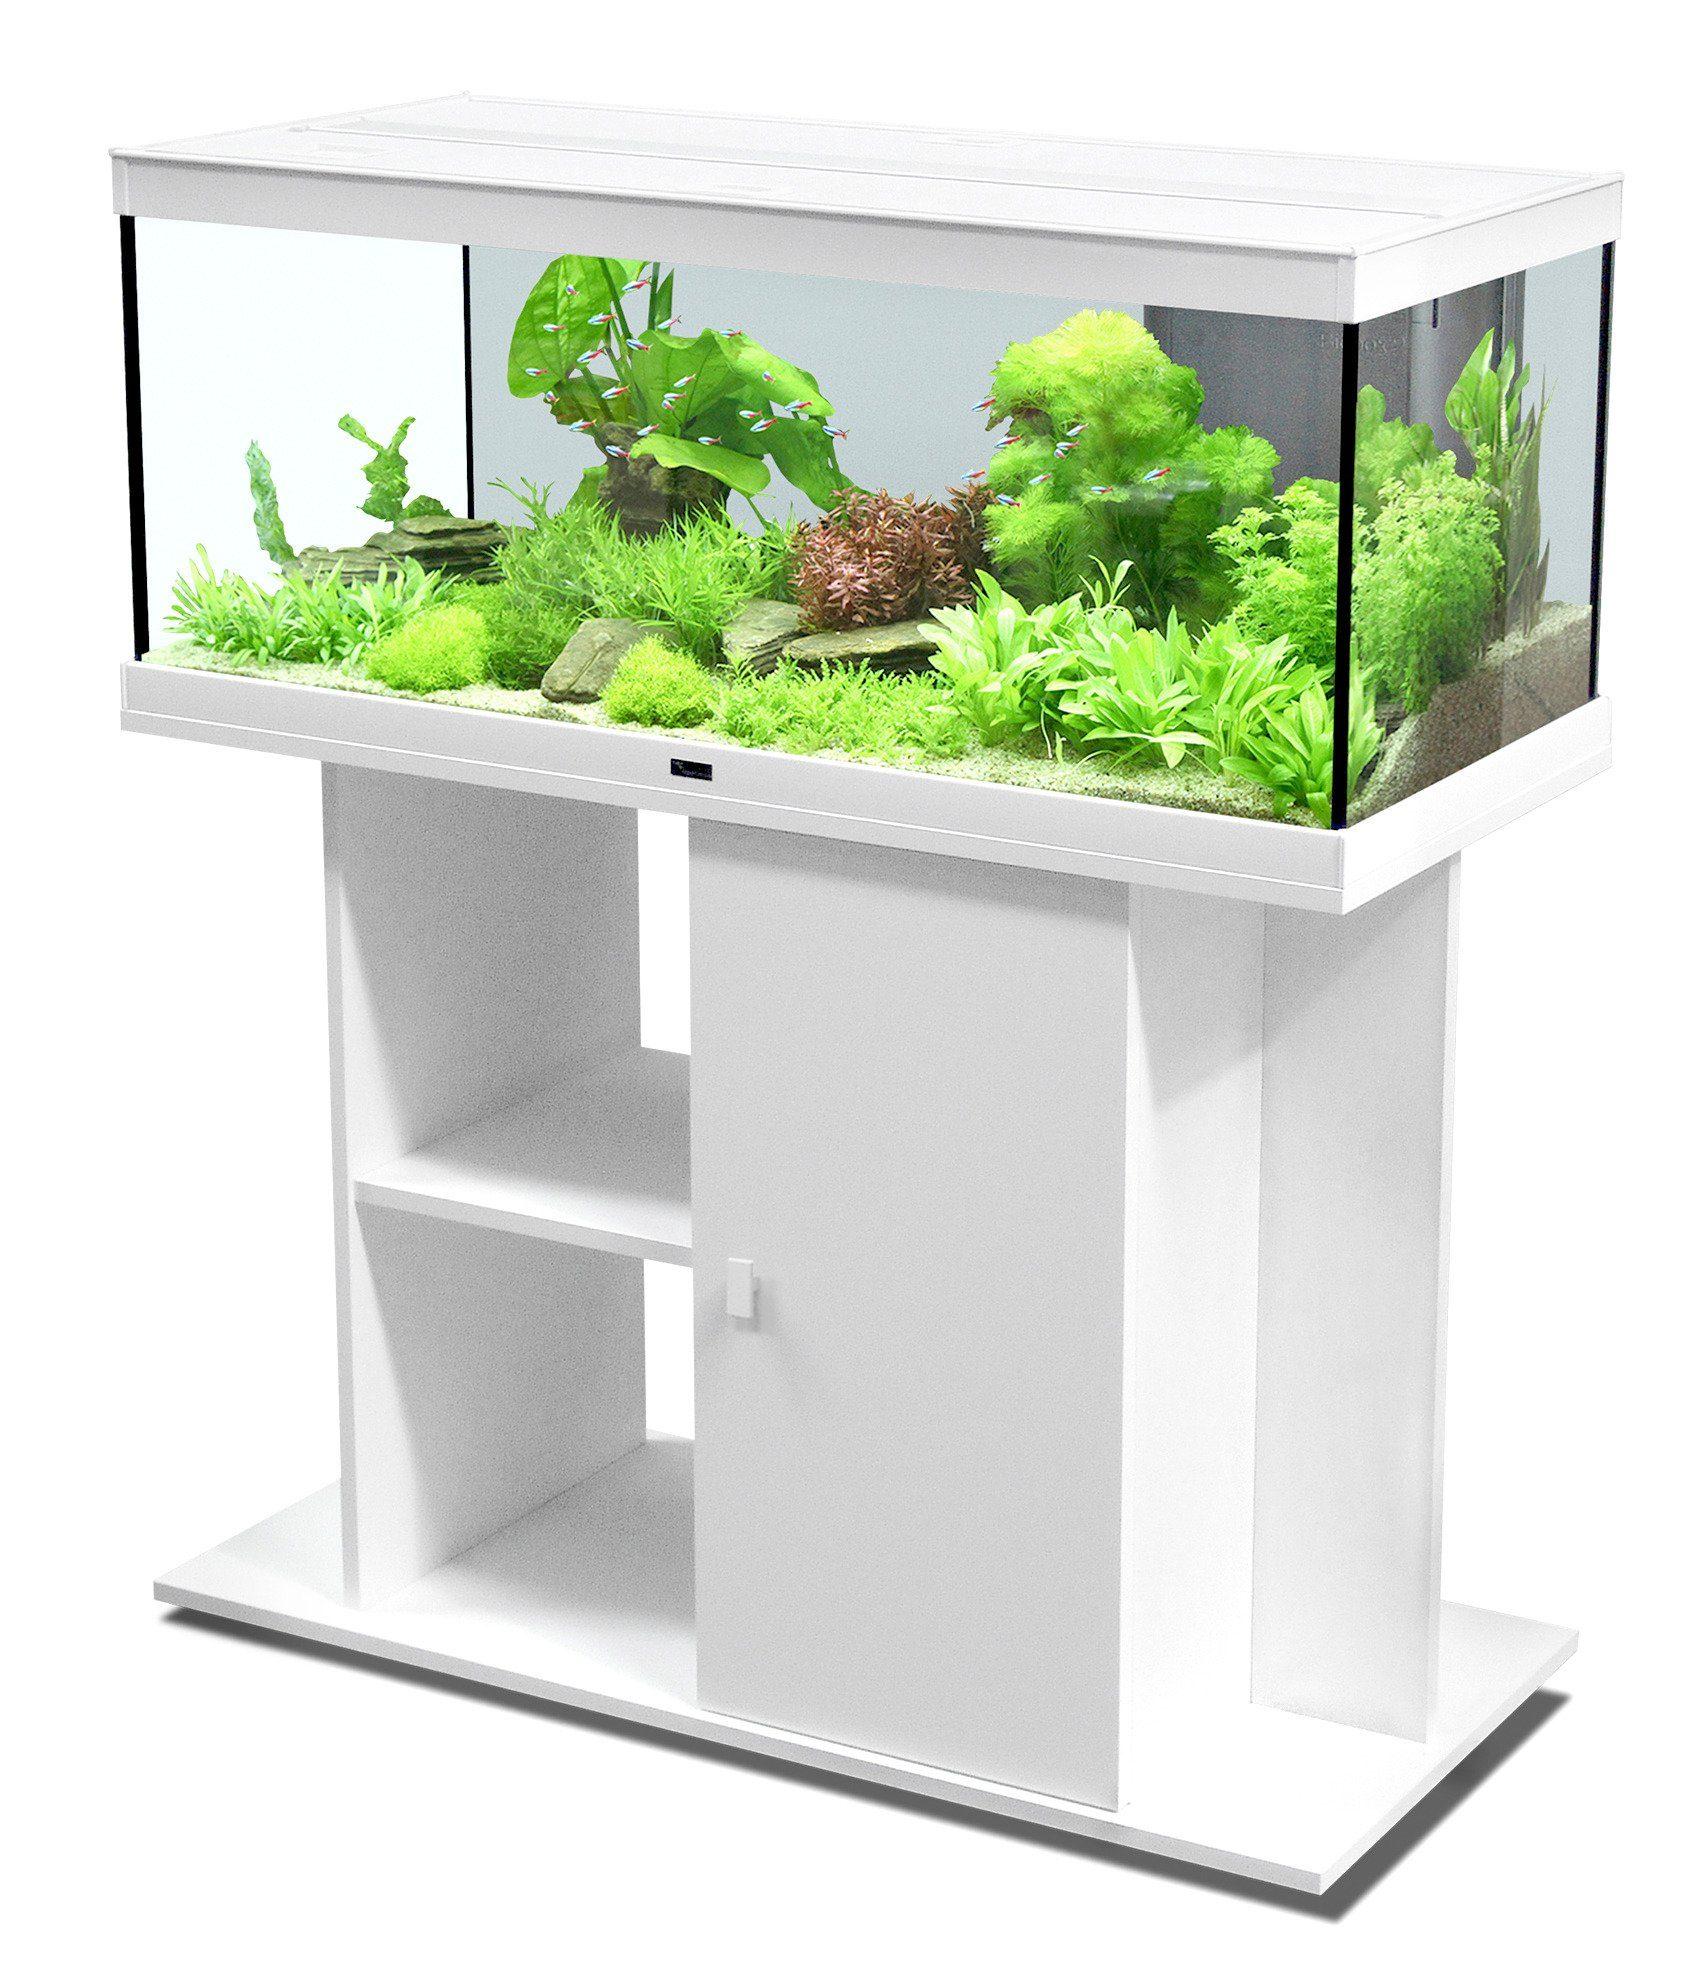 Aquarien-Set »Style 100 LED«, weiß (B/T/H: 100/40/40 cm)